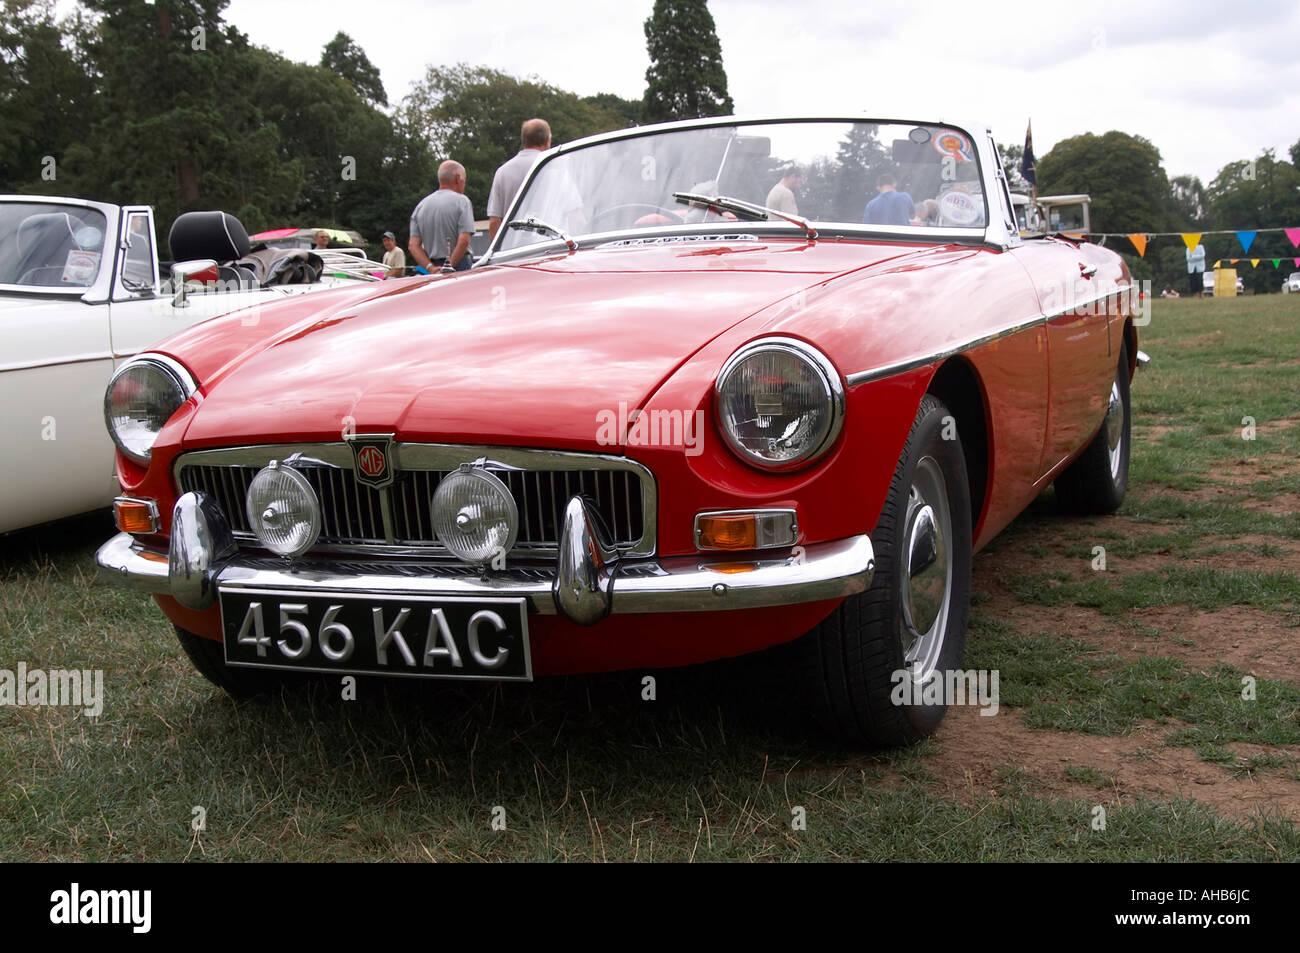 Mgb roadster english british sportscar british leyland model